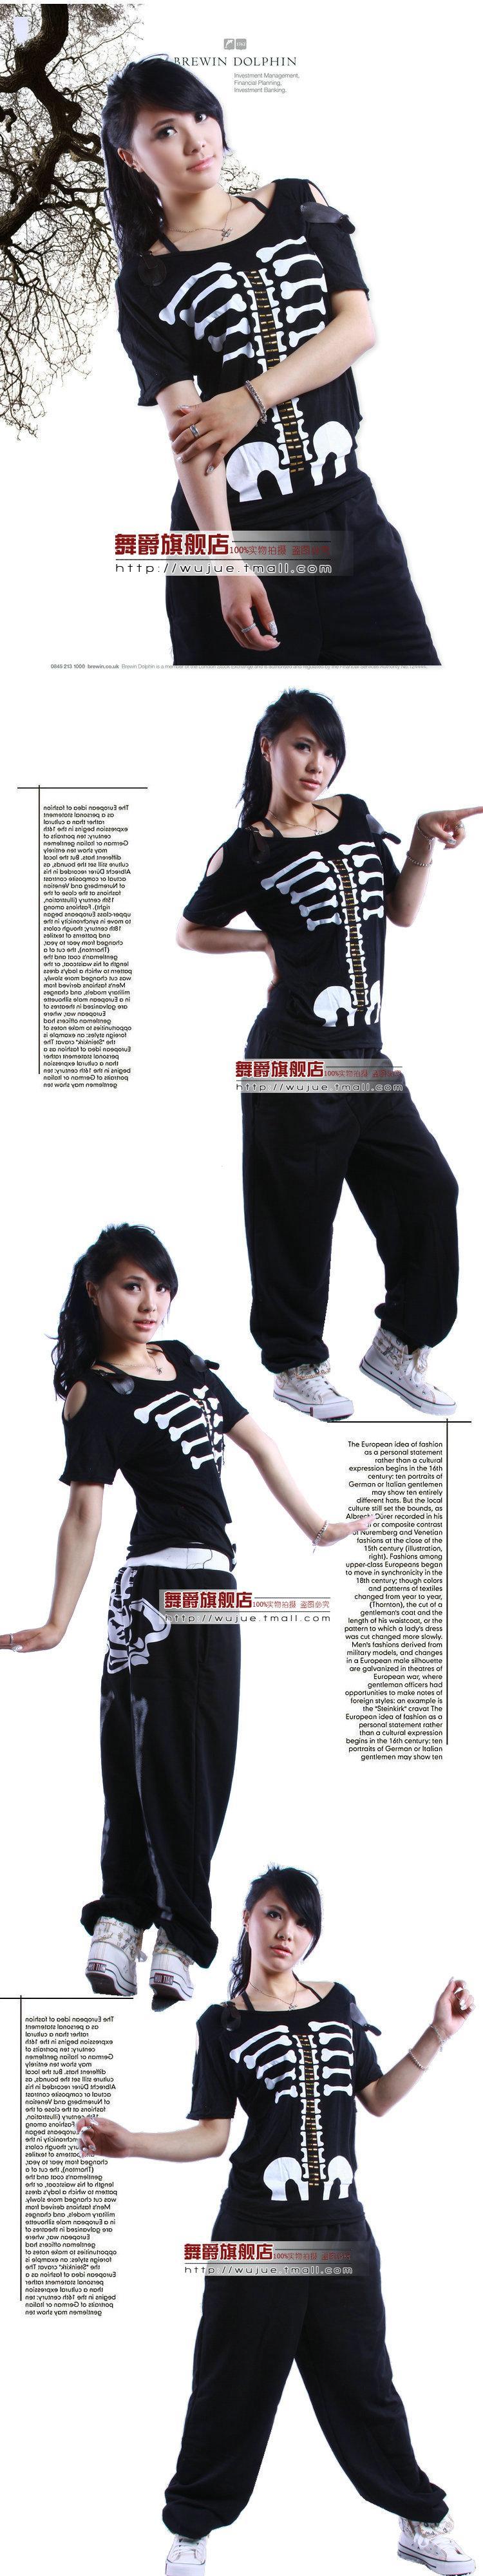 baru busana Harem Pants Hip Hop Dance Sweatpants kasual Kostum perempuan tahap memakai kinerja neon stripe jazz celana olahraga